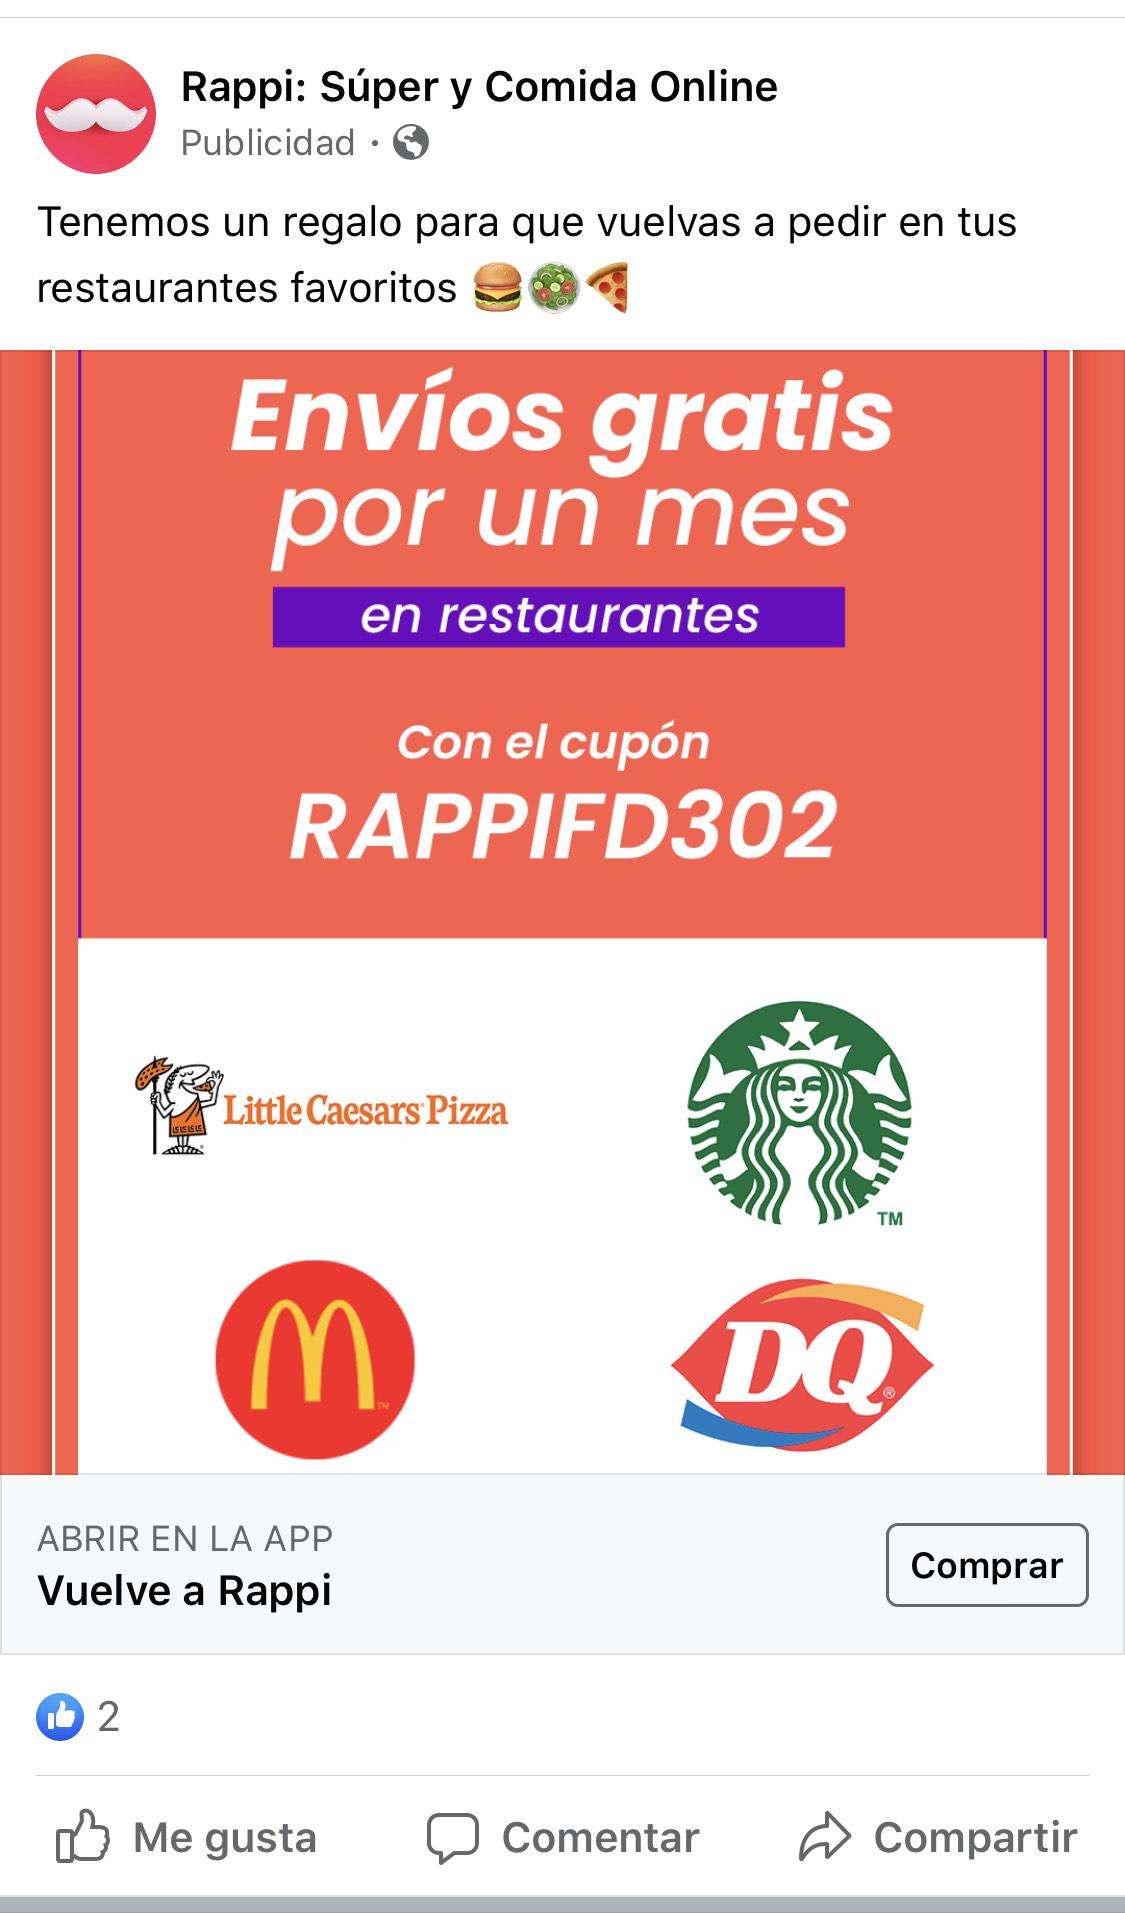 Rappi: Envíos gratis por un mes